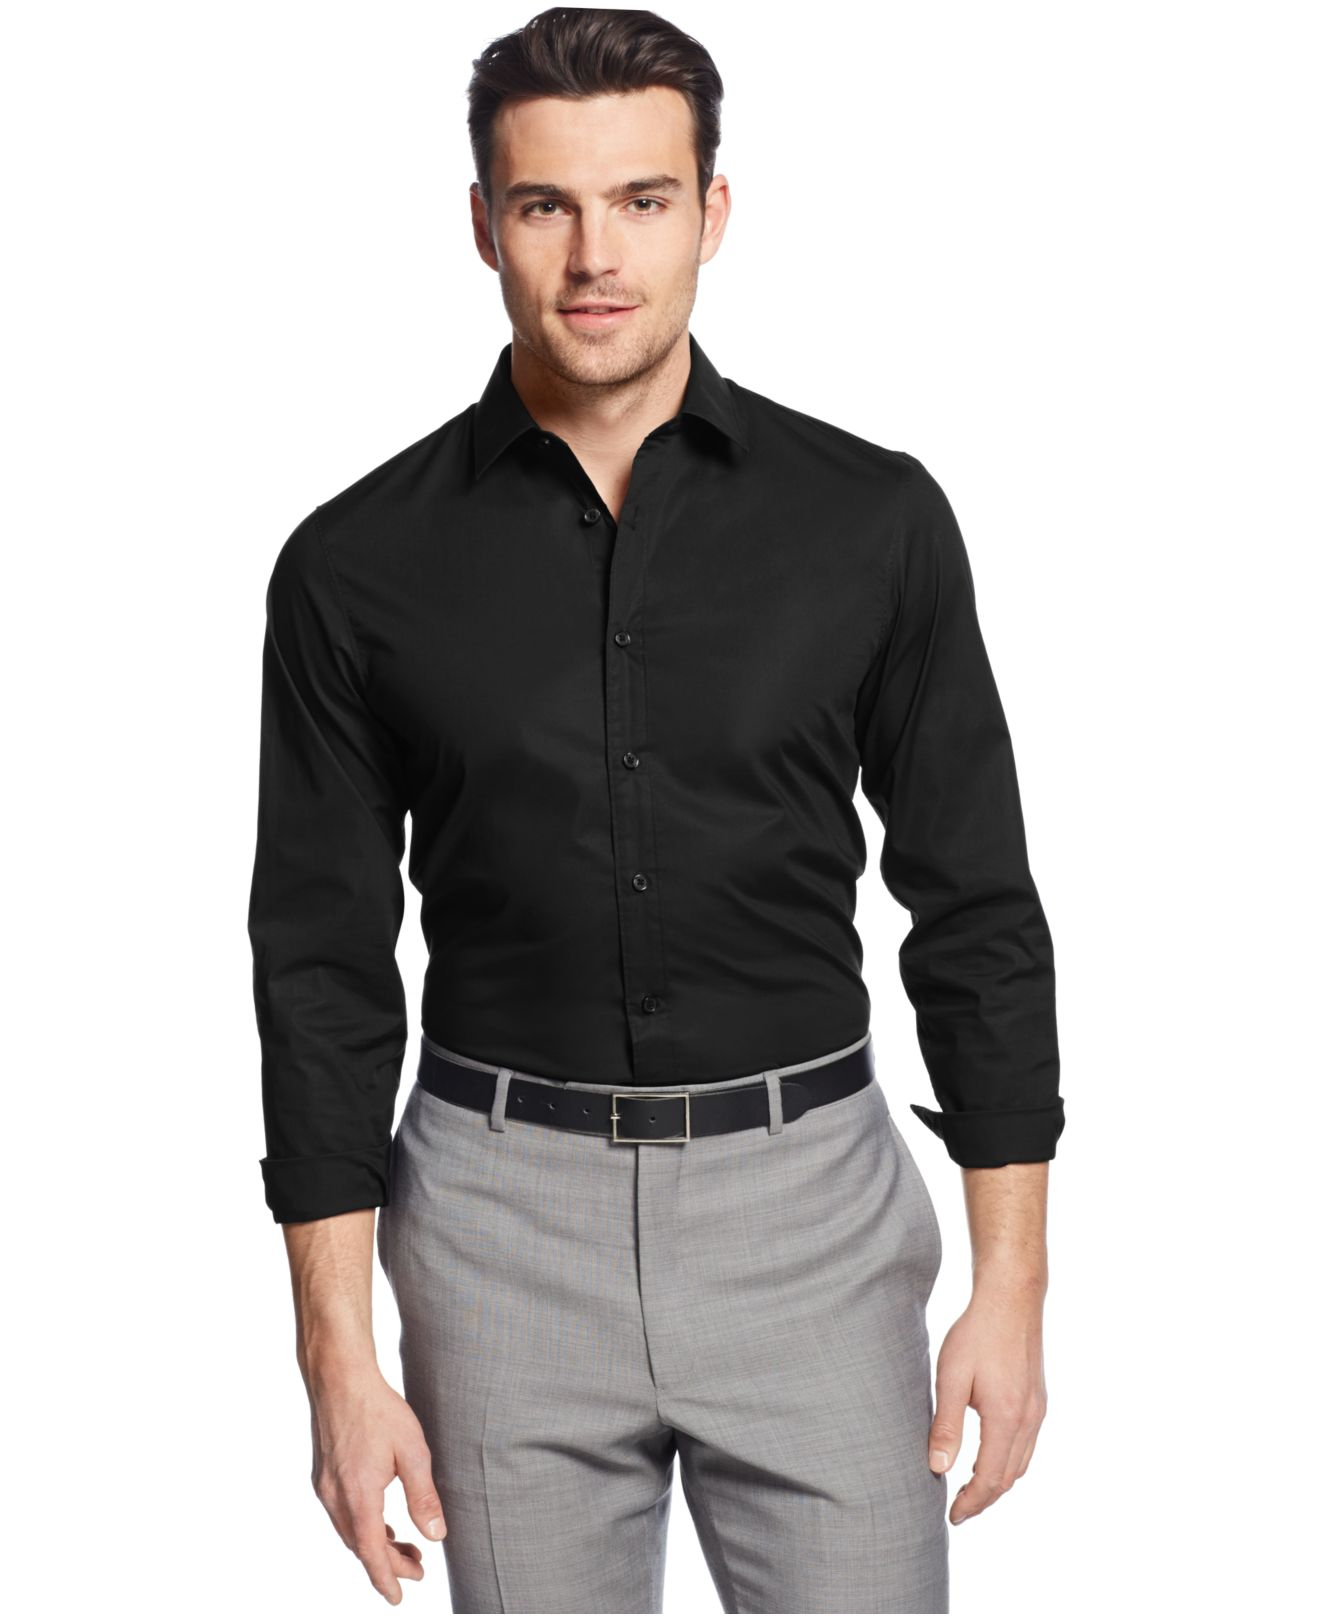 Lyst - Michael kors Tailored-Fit Shirt in Black for Men